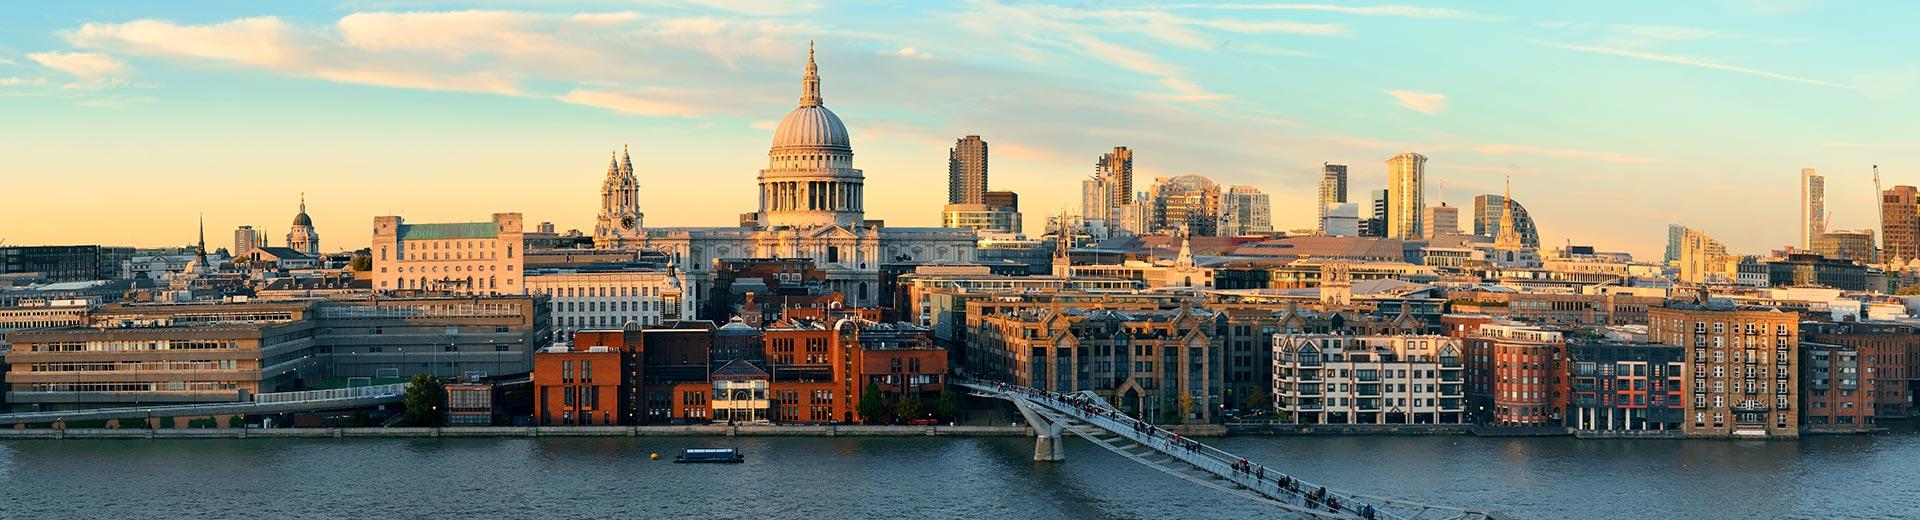 Gruppenreise London